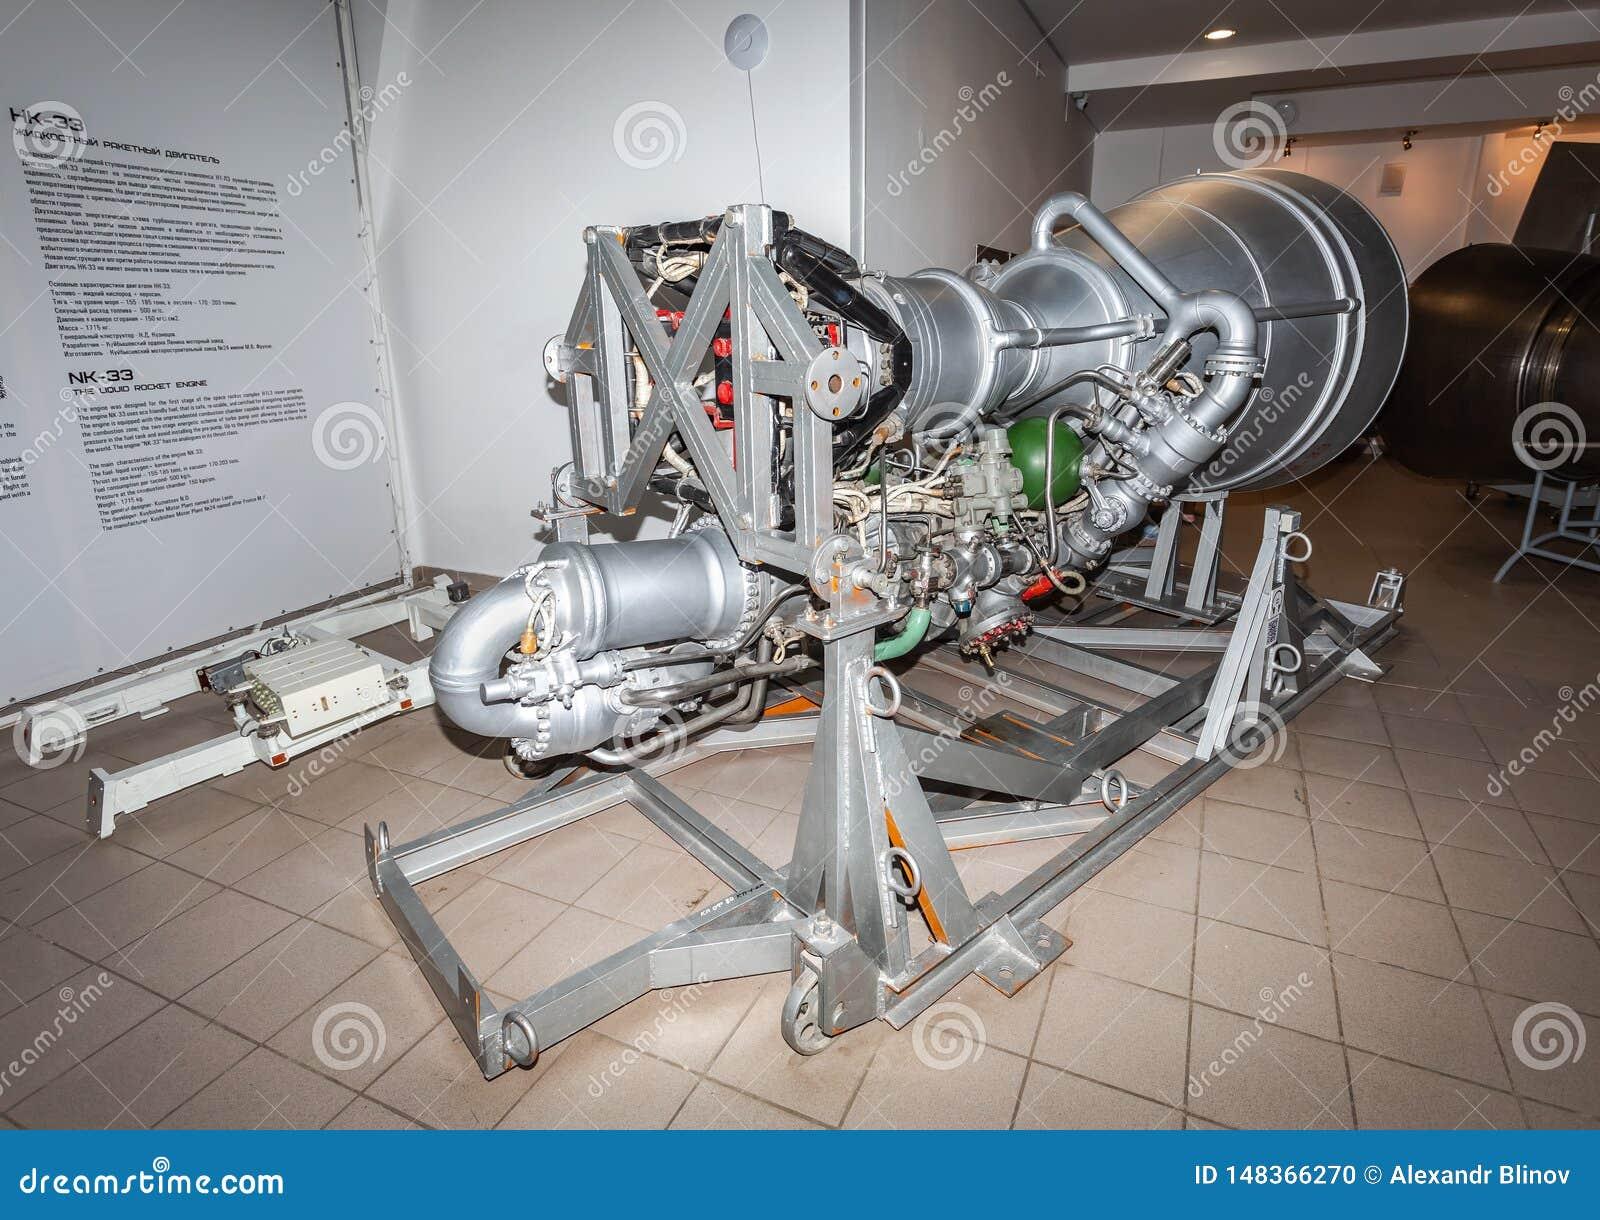 Motor de foguete líquido NK-33